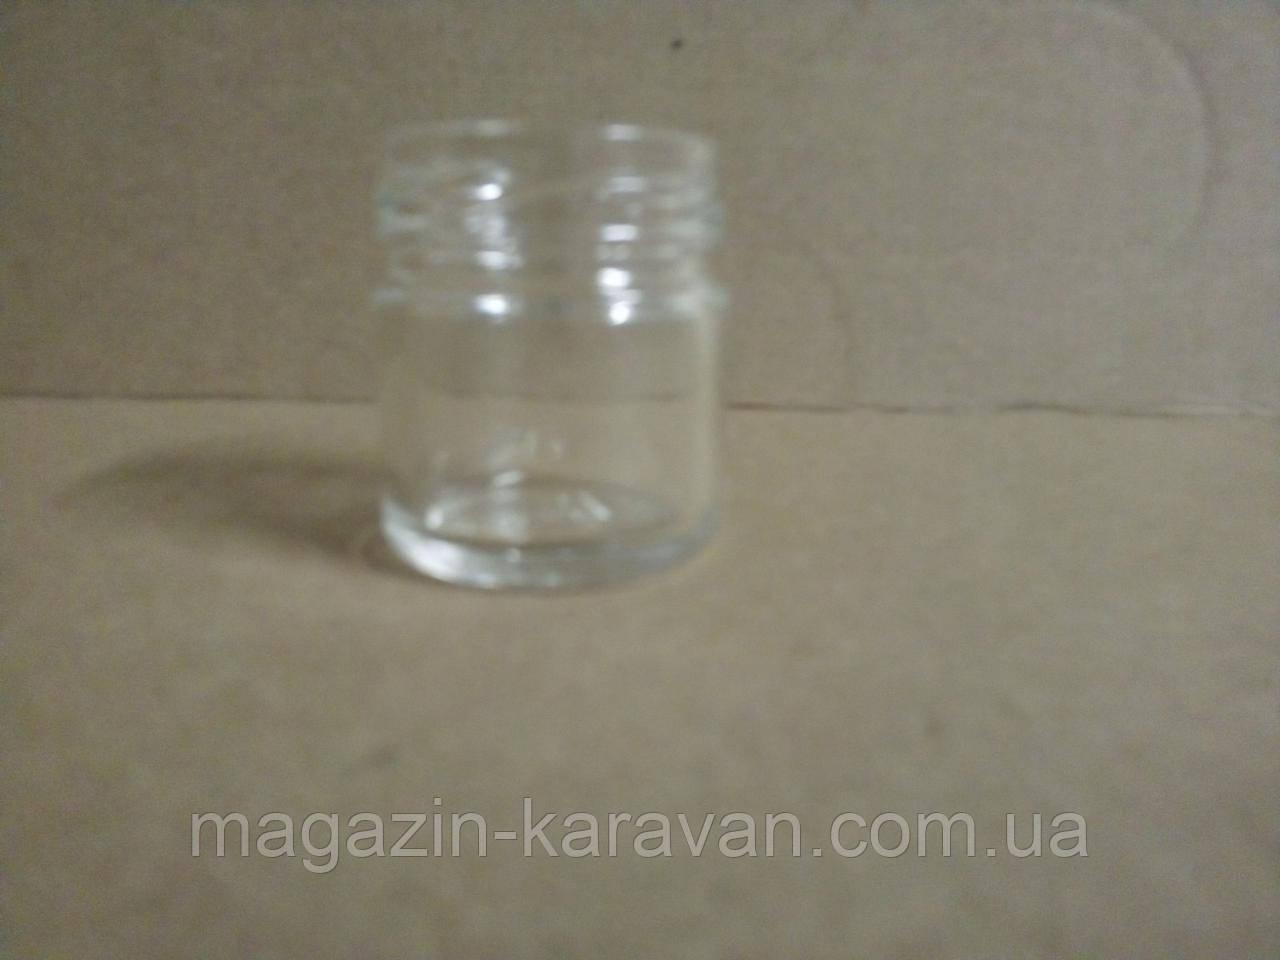 Банка стеклянная 40 мл ТО-43 (50 шт/уп)